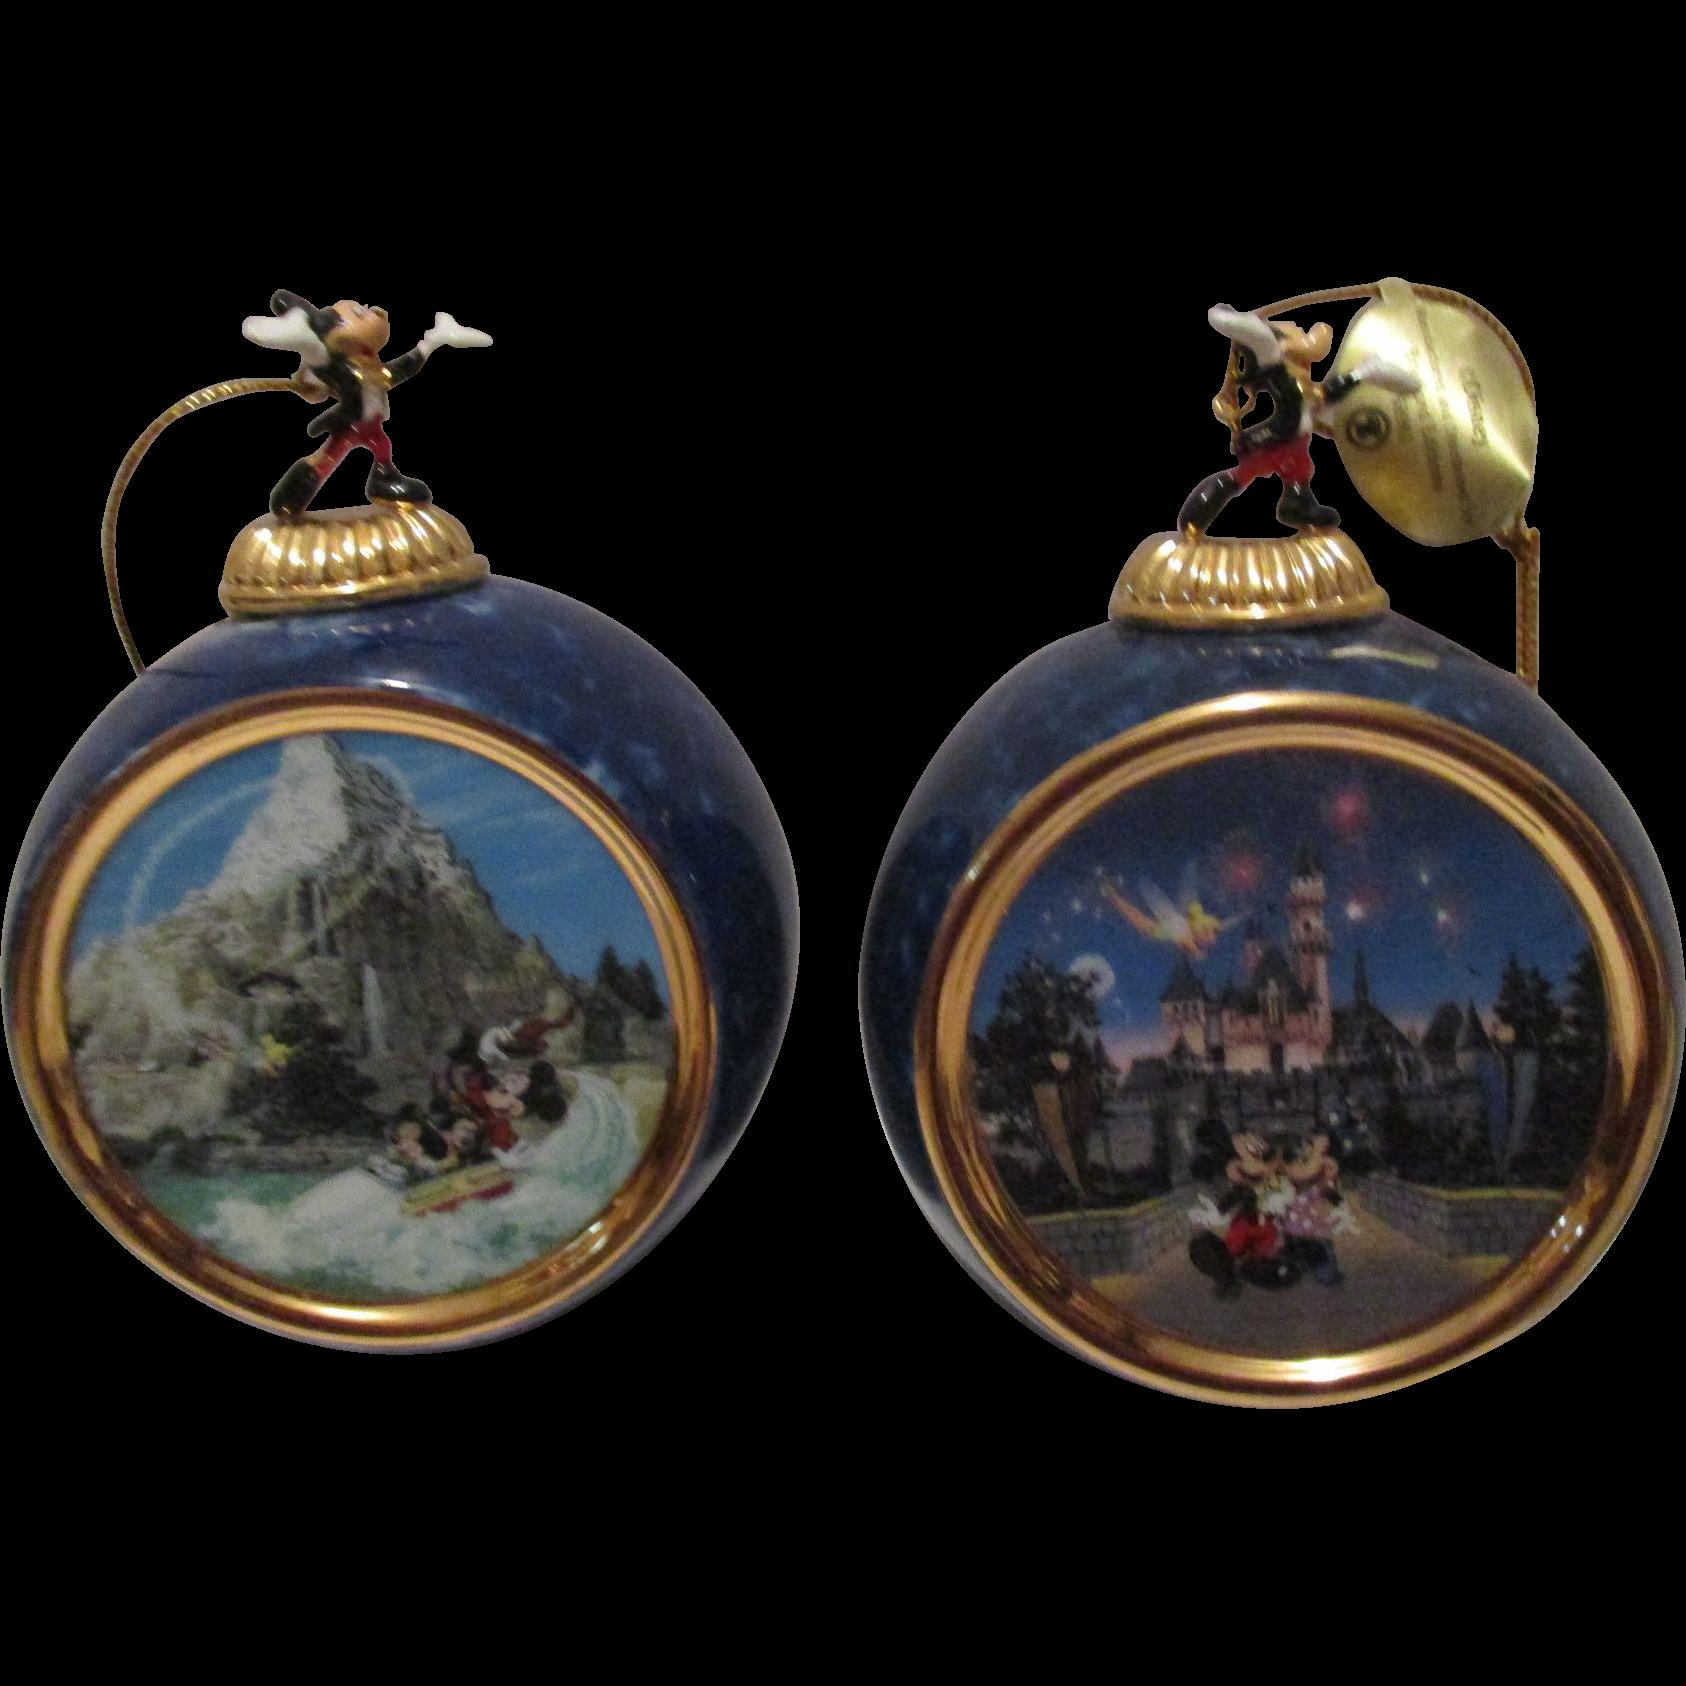 Vintage Disney Christmas Ornament Sold On Ruby Lane